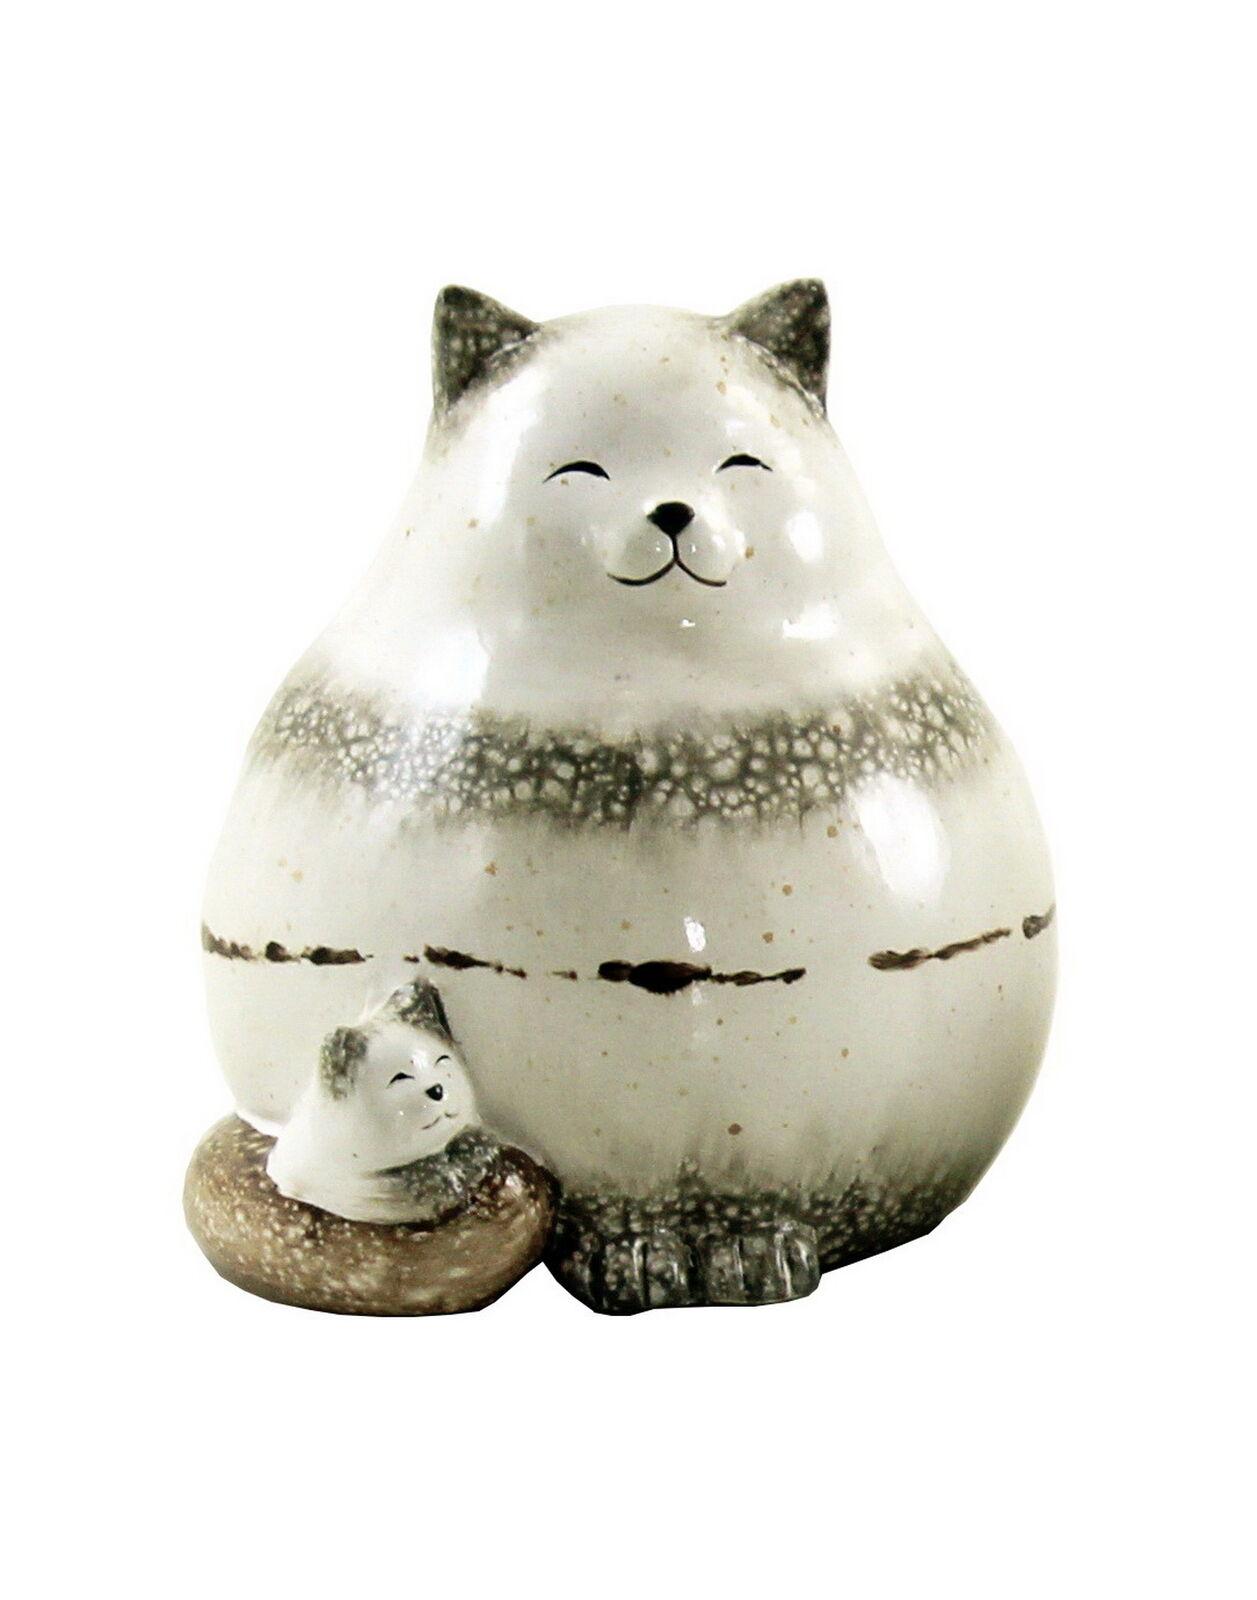 Deko Katze Mit Kind Baby Katzen Tier Garten Figur Skulptur Keramik Kater Statue